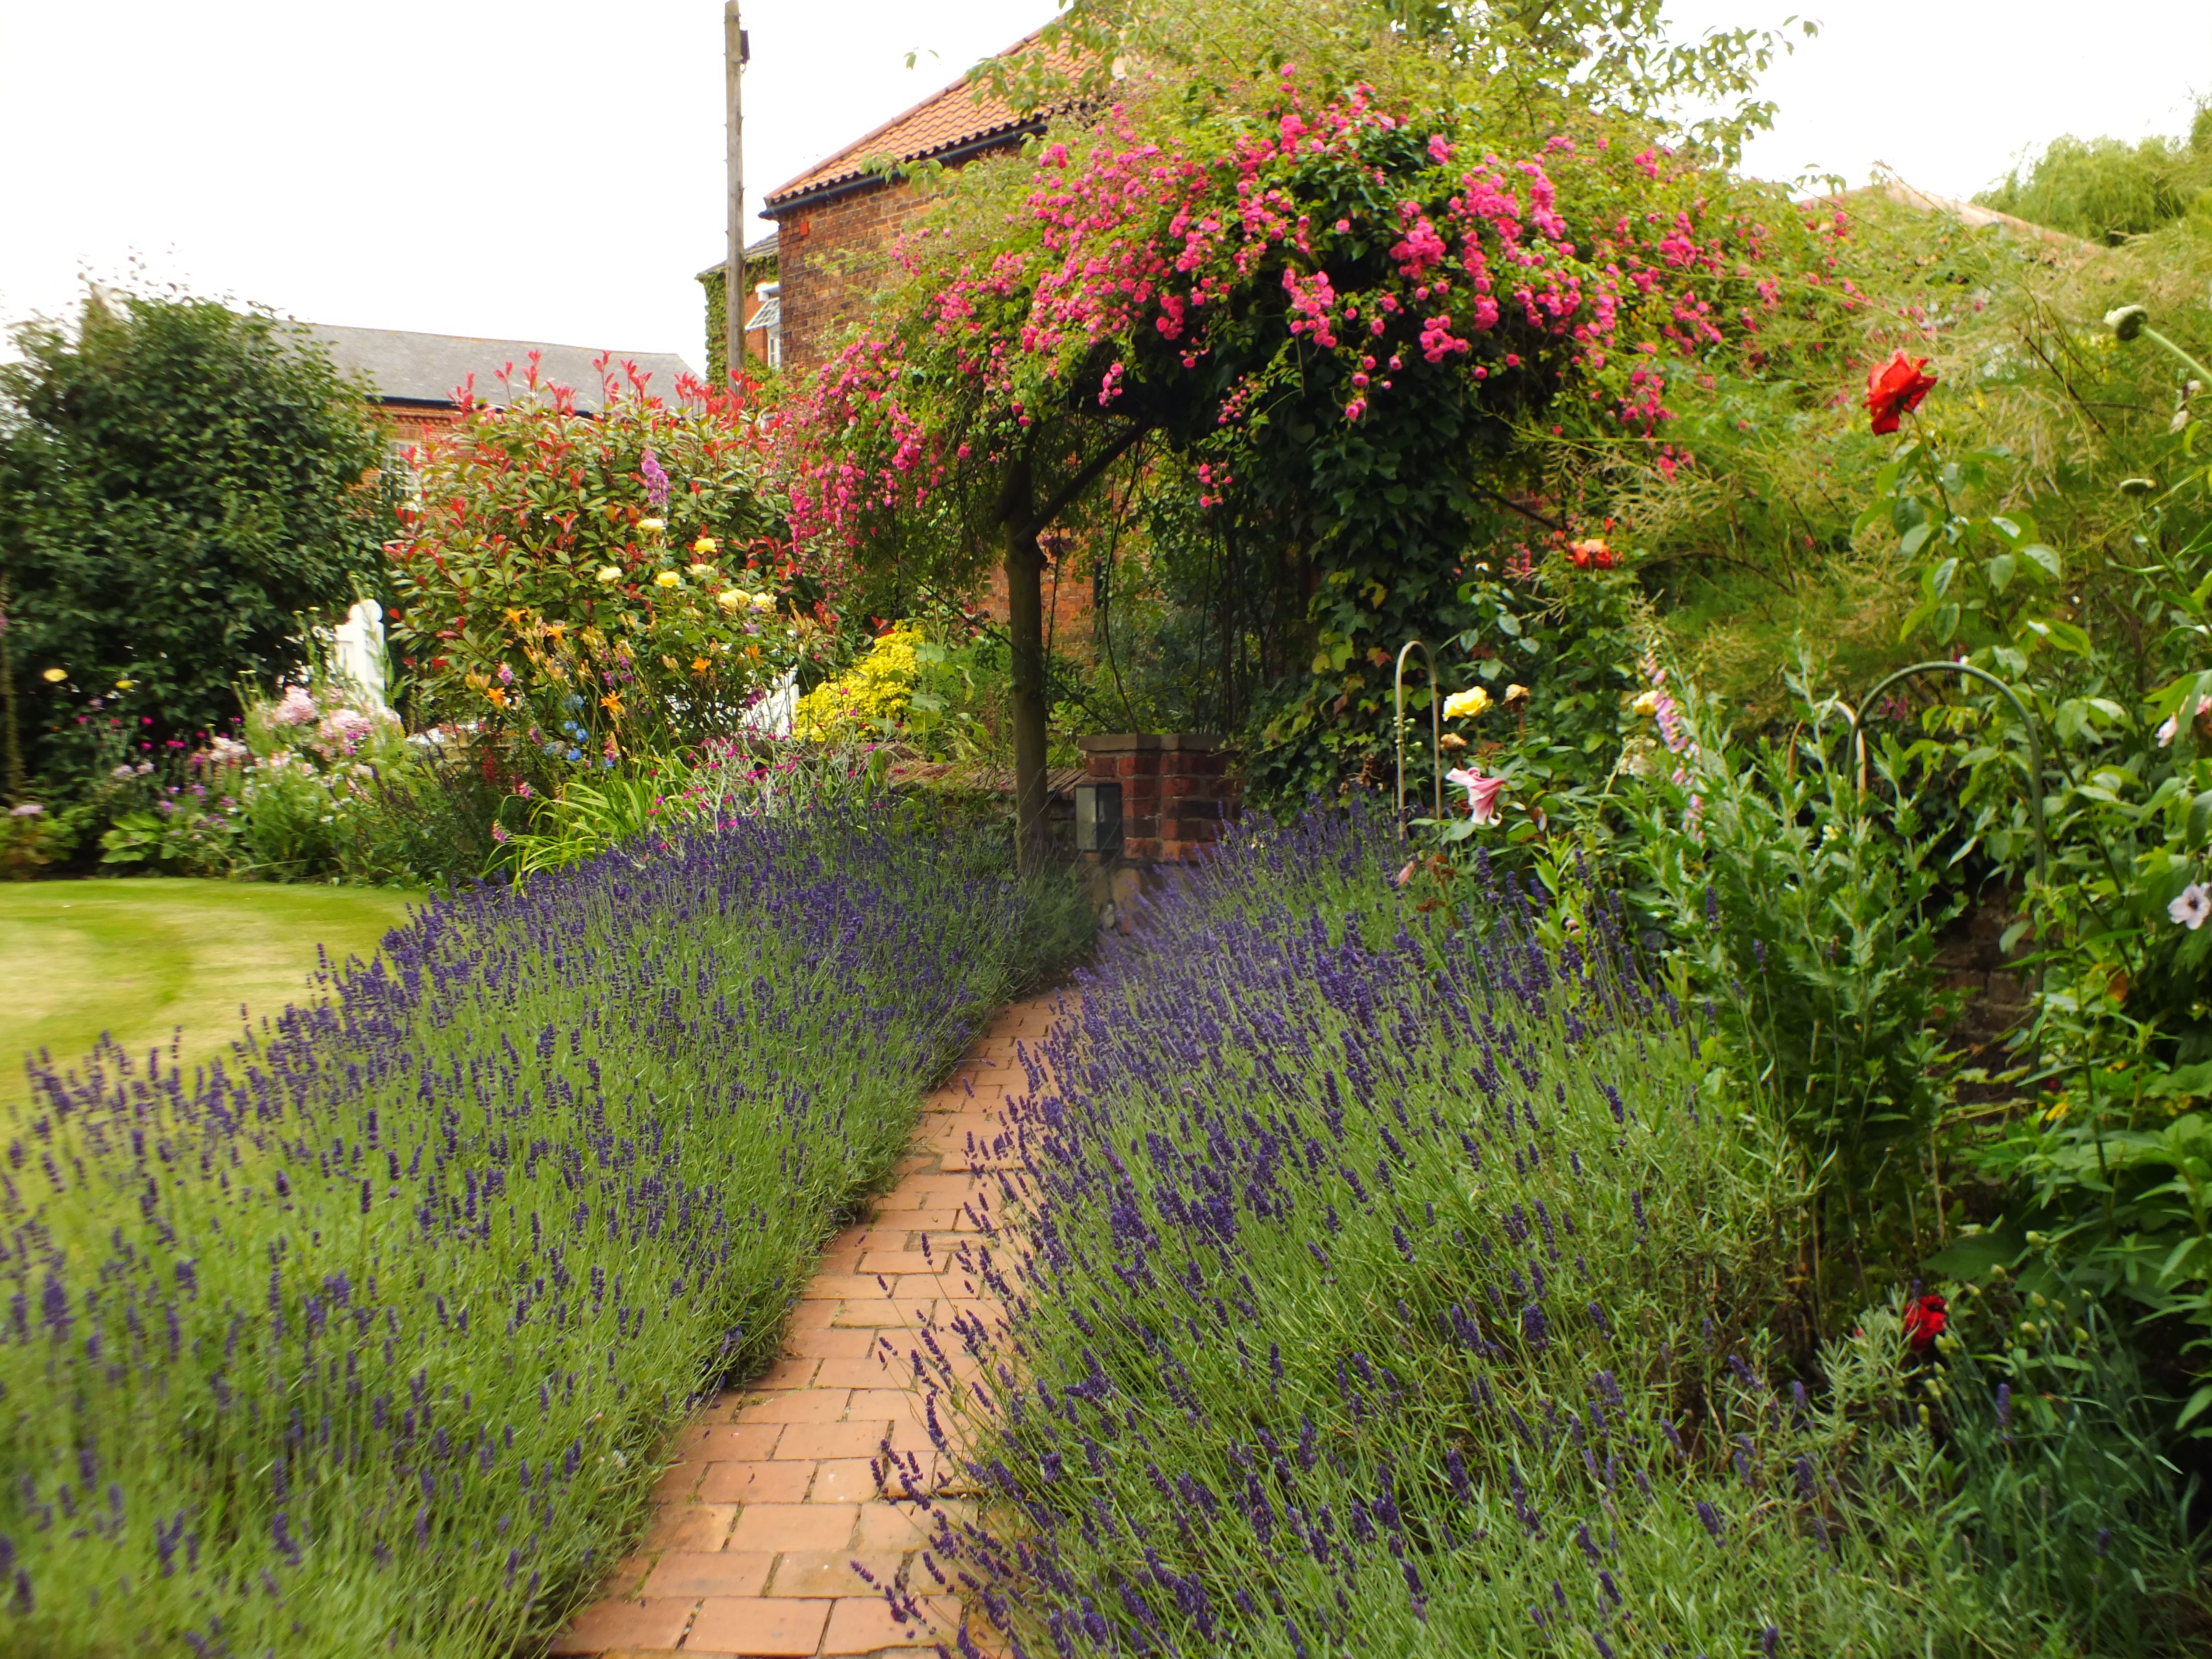 A lavender pathway